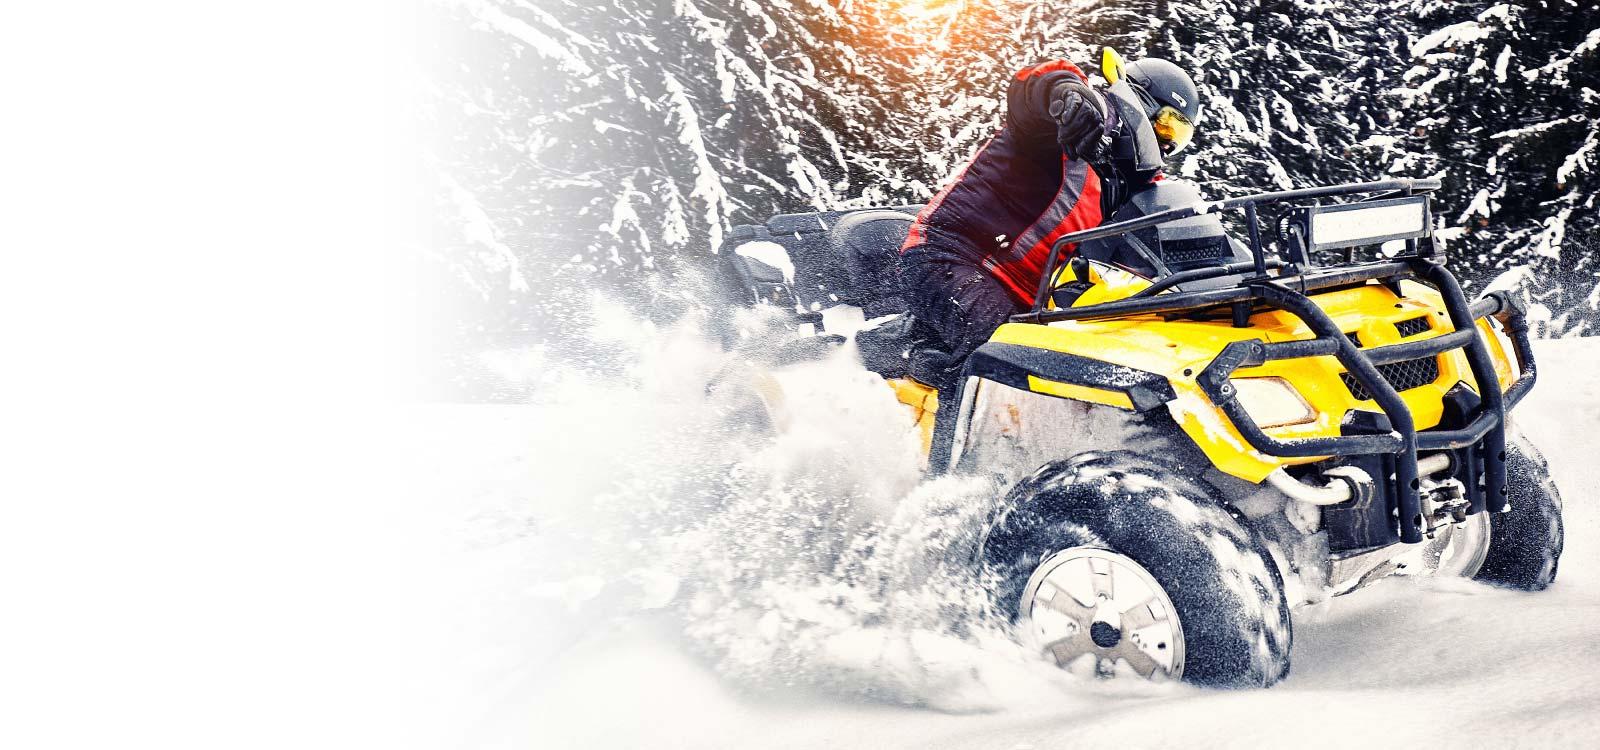 Winter Toy Image ATV rider in the snow